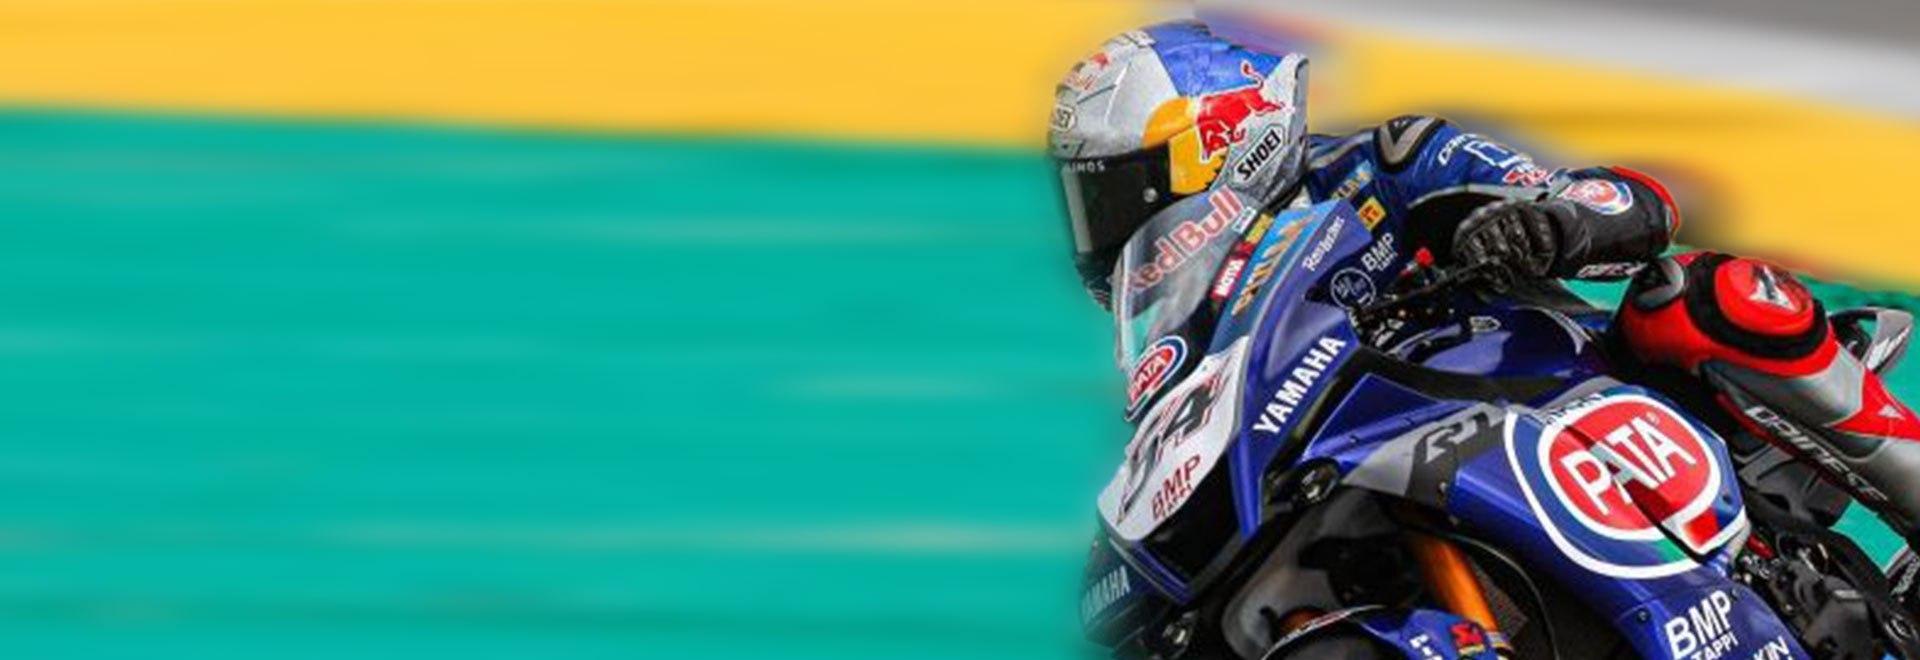 Aragona Race 1